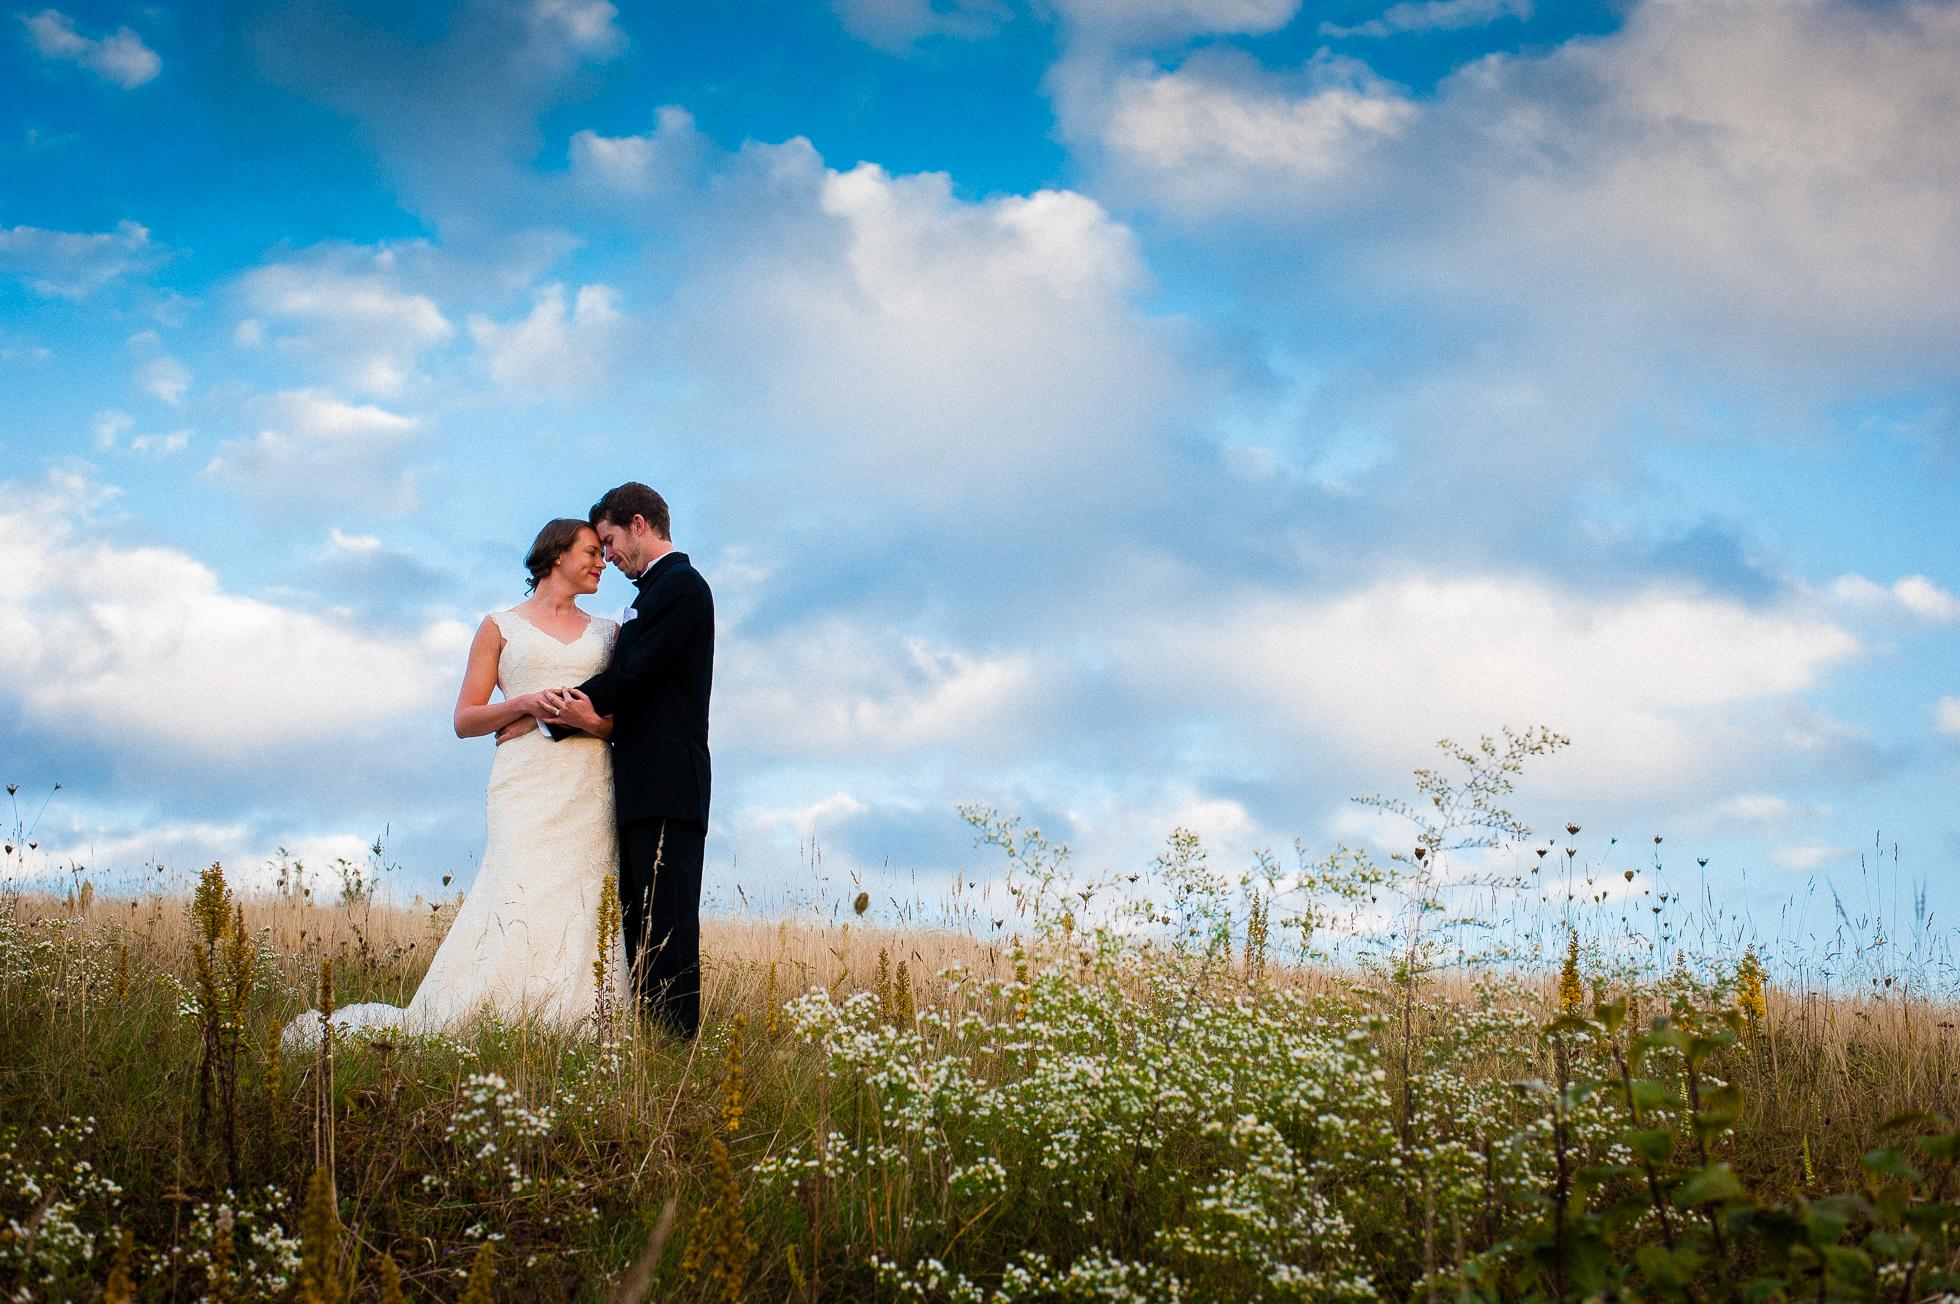 Asheville wedding photography for adventurous couples